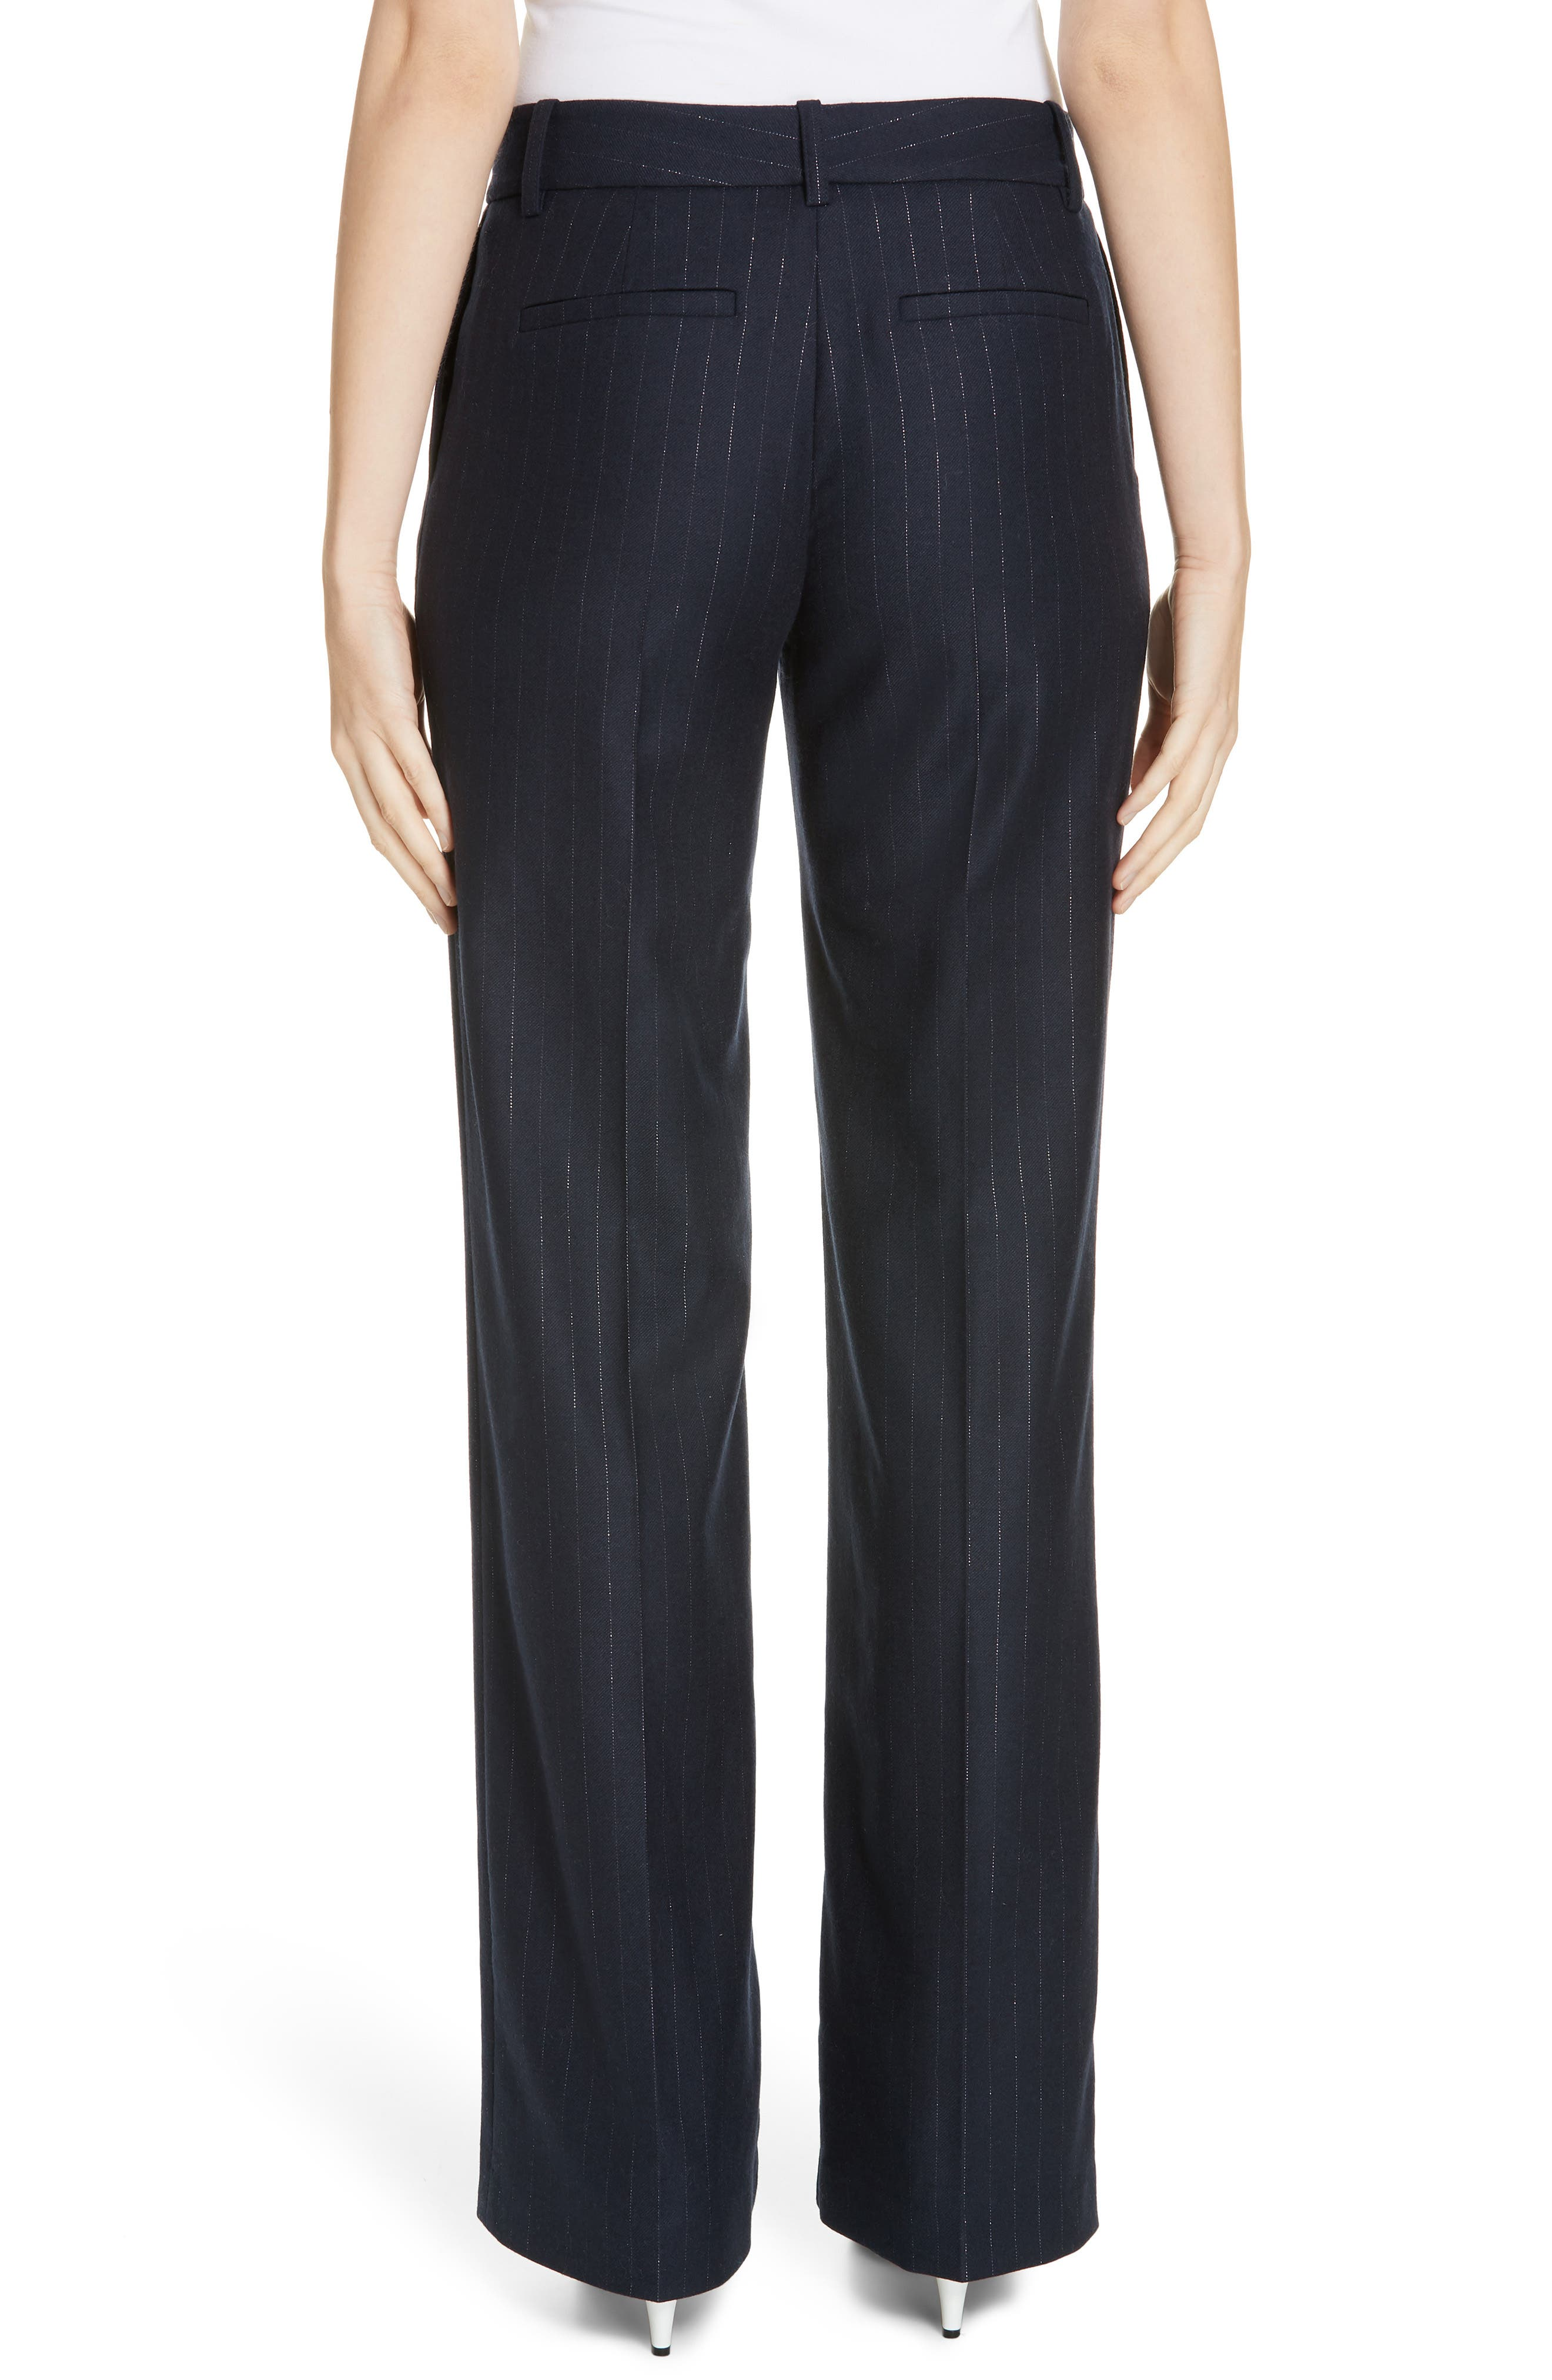 Hagan Trousers,                             Alternate thumbnail 2, color,                             NAVY